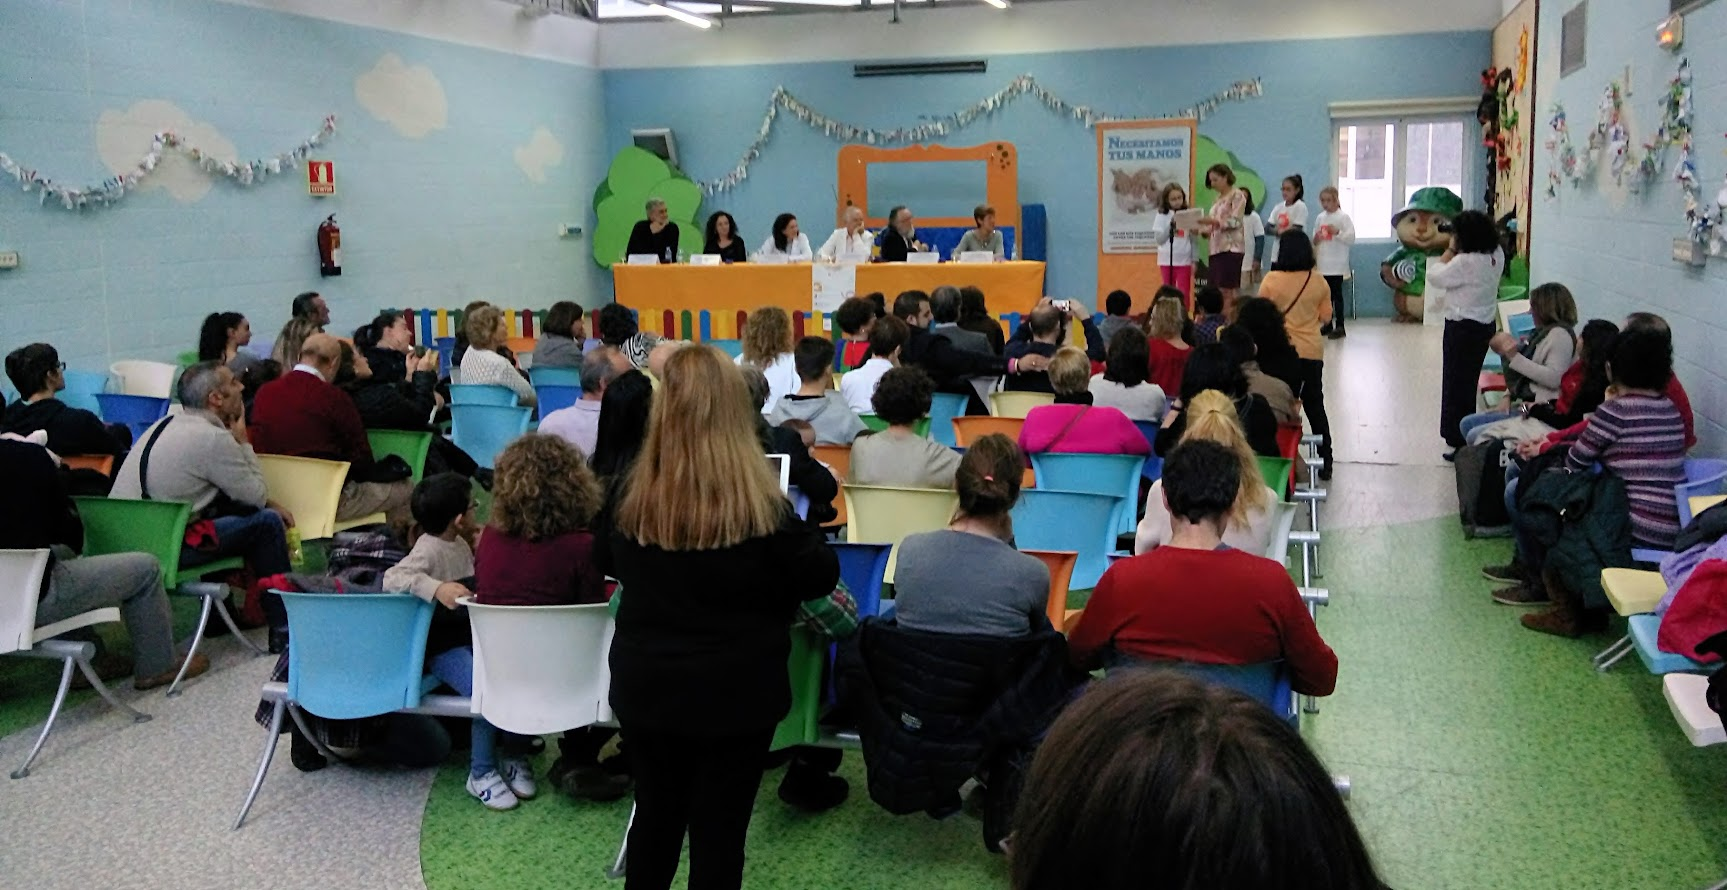 discurso-niños-prematuros-2016-madrid